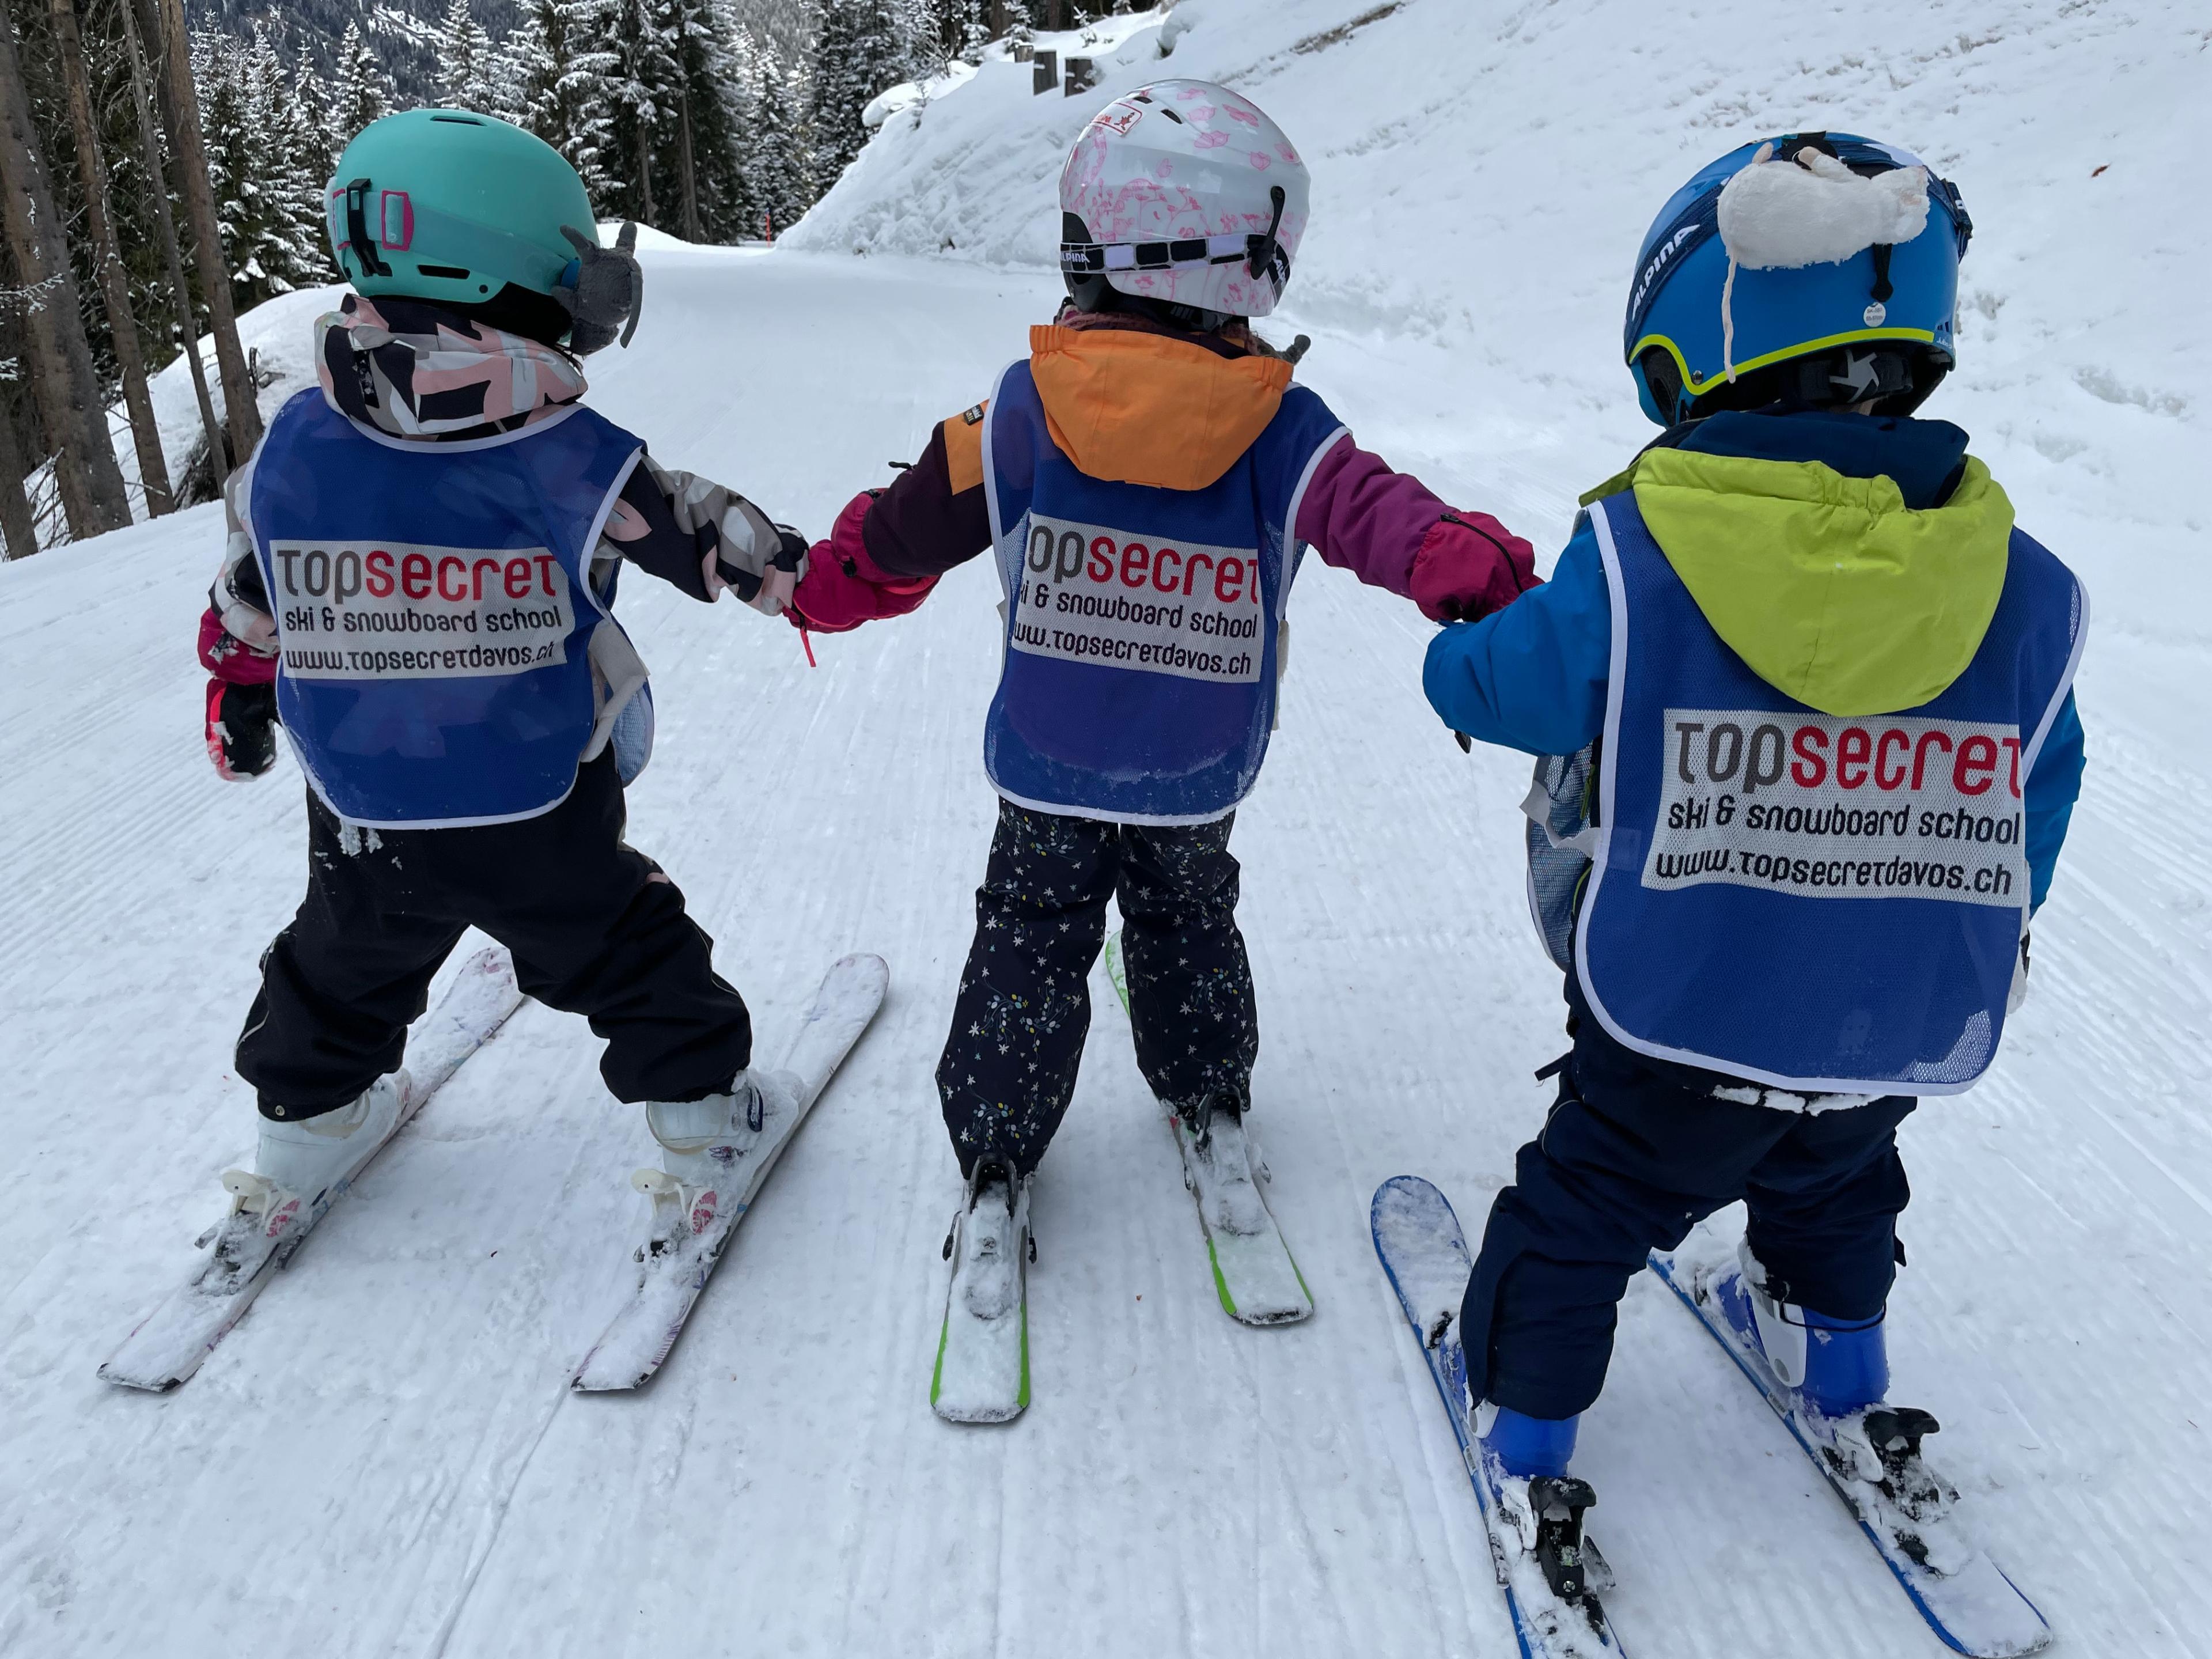 Kids Ski Lessons (4-17 y.) for Advanced Skiers